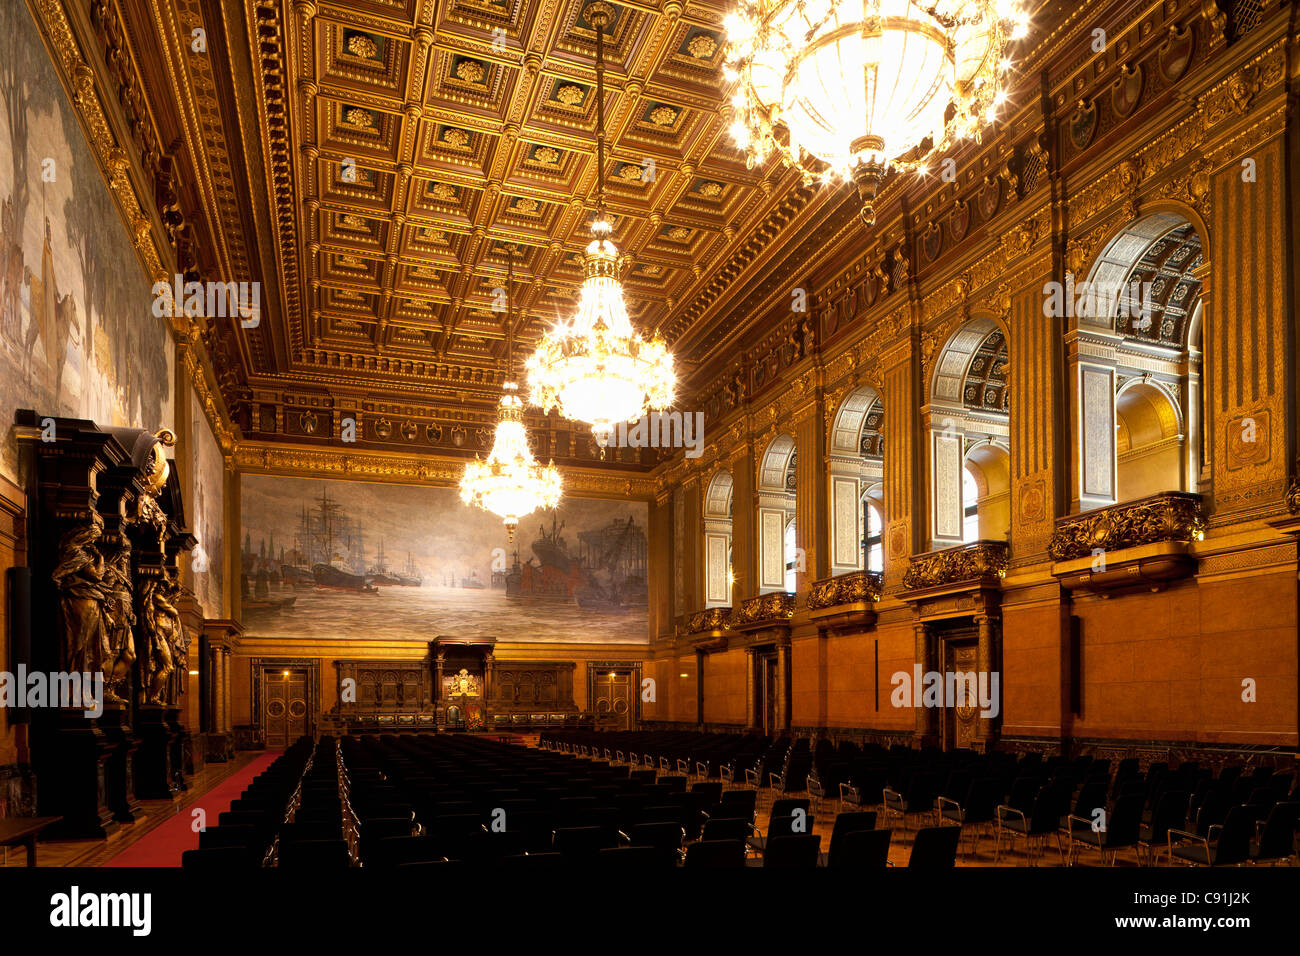 Grosser Festsaal, Artist Hugo Vogel, Hamburg Town Hall, Hanseatic city of Hamburg, Germany, Europe - Stock Image